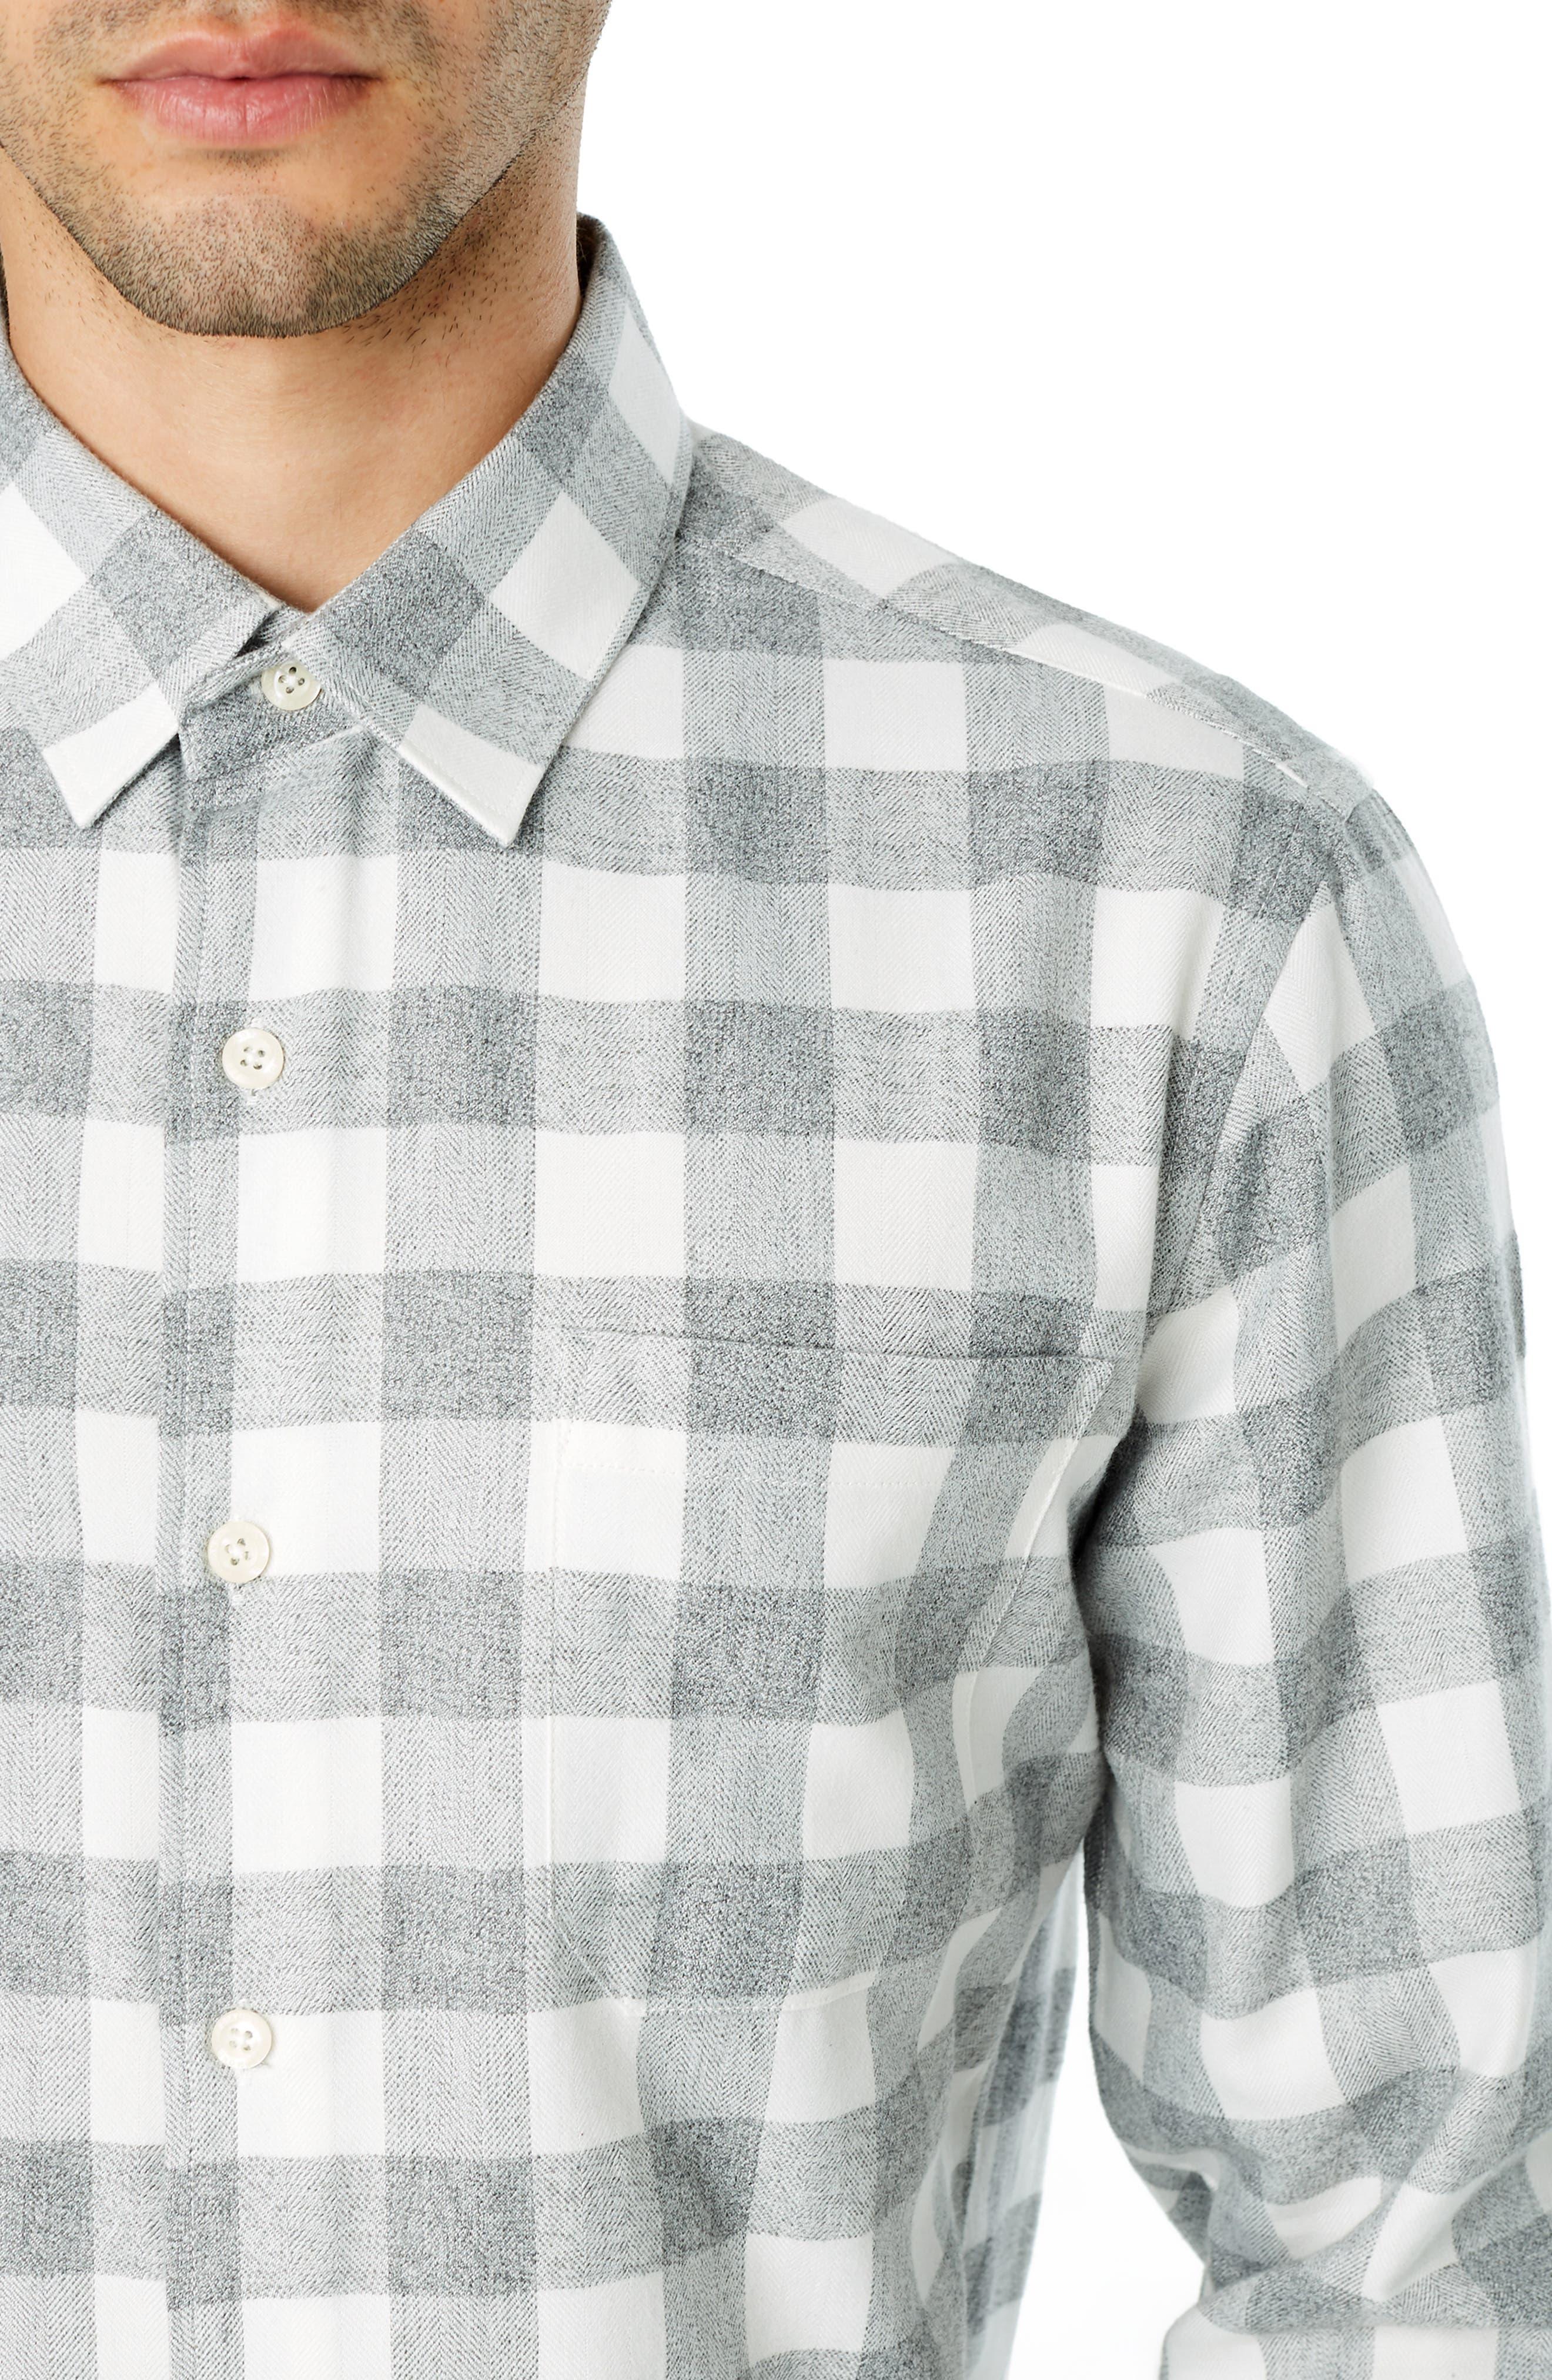 Sparrow Trim Fit Flannel Shirt,                             Alternate thumbnail 2, color,                             GREY WHITE